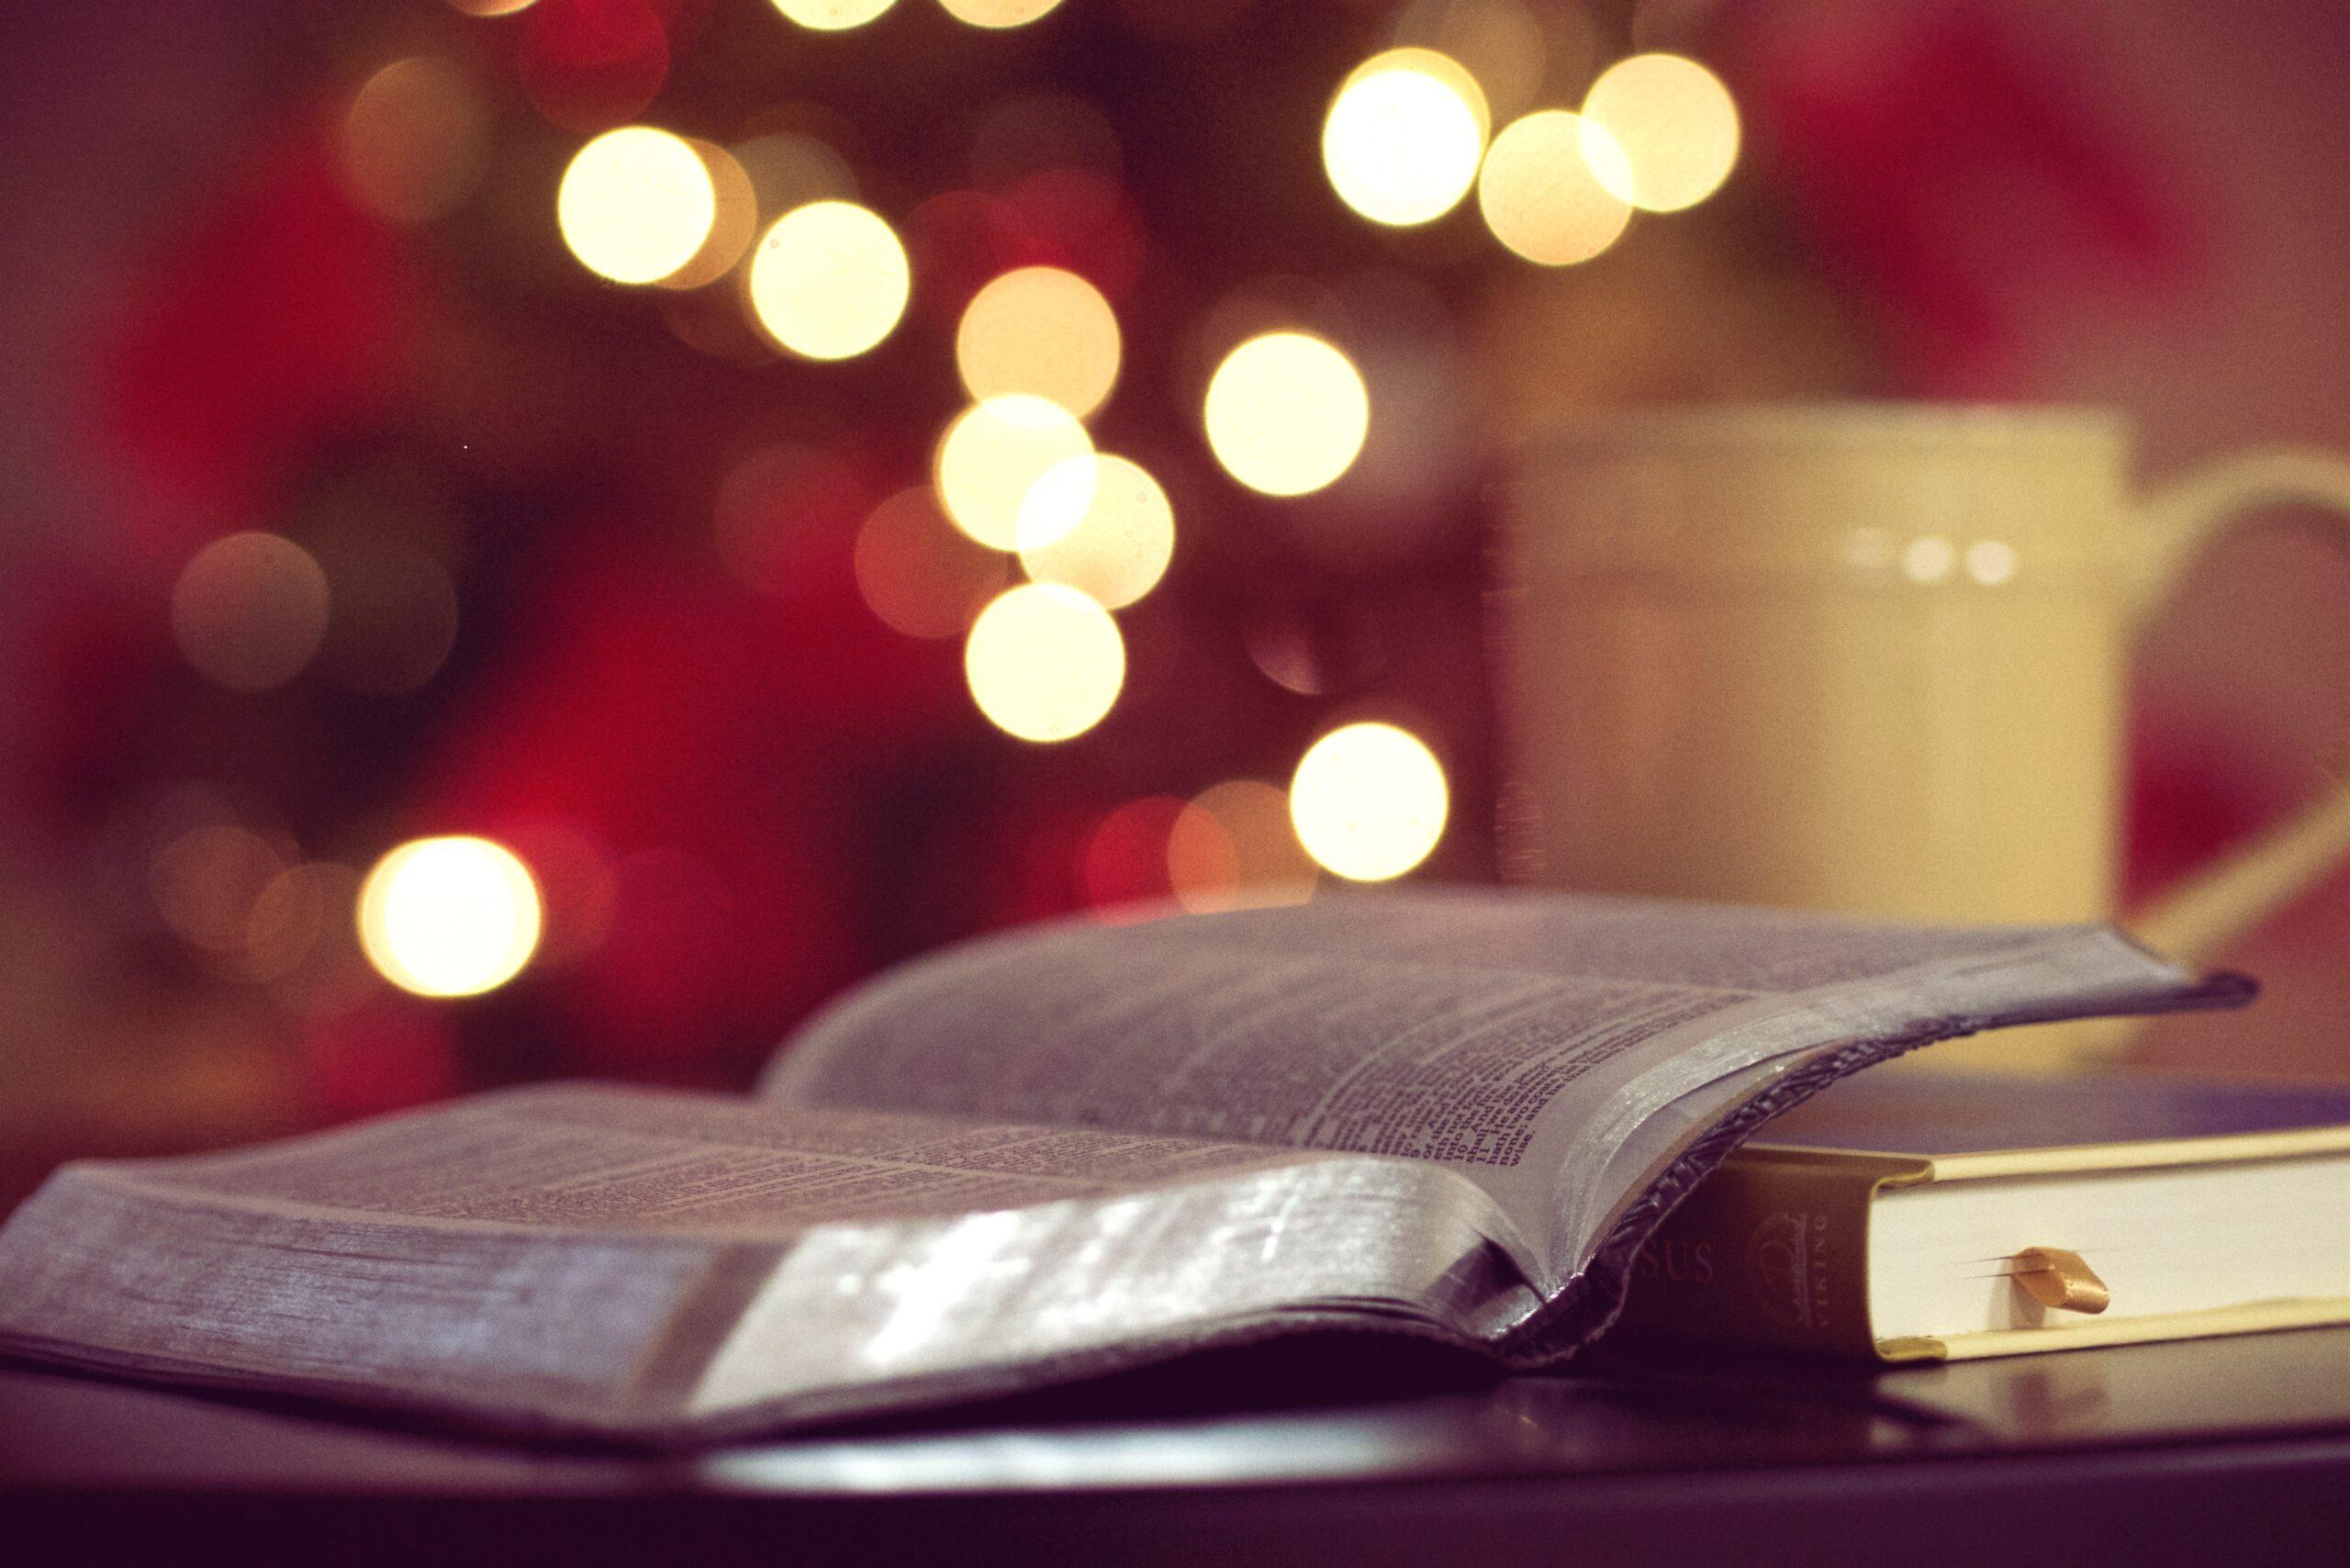 christmas books and entertainment